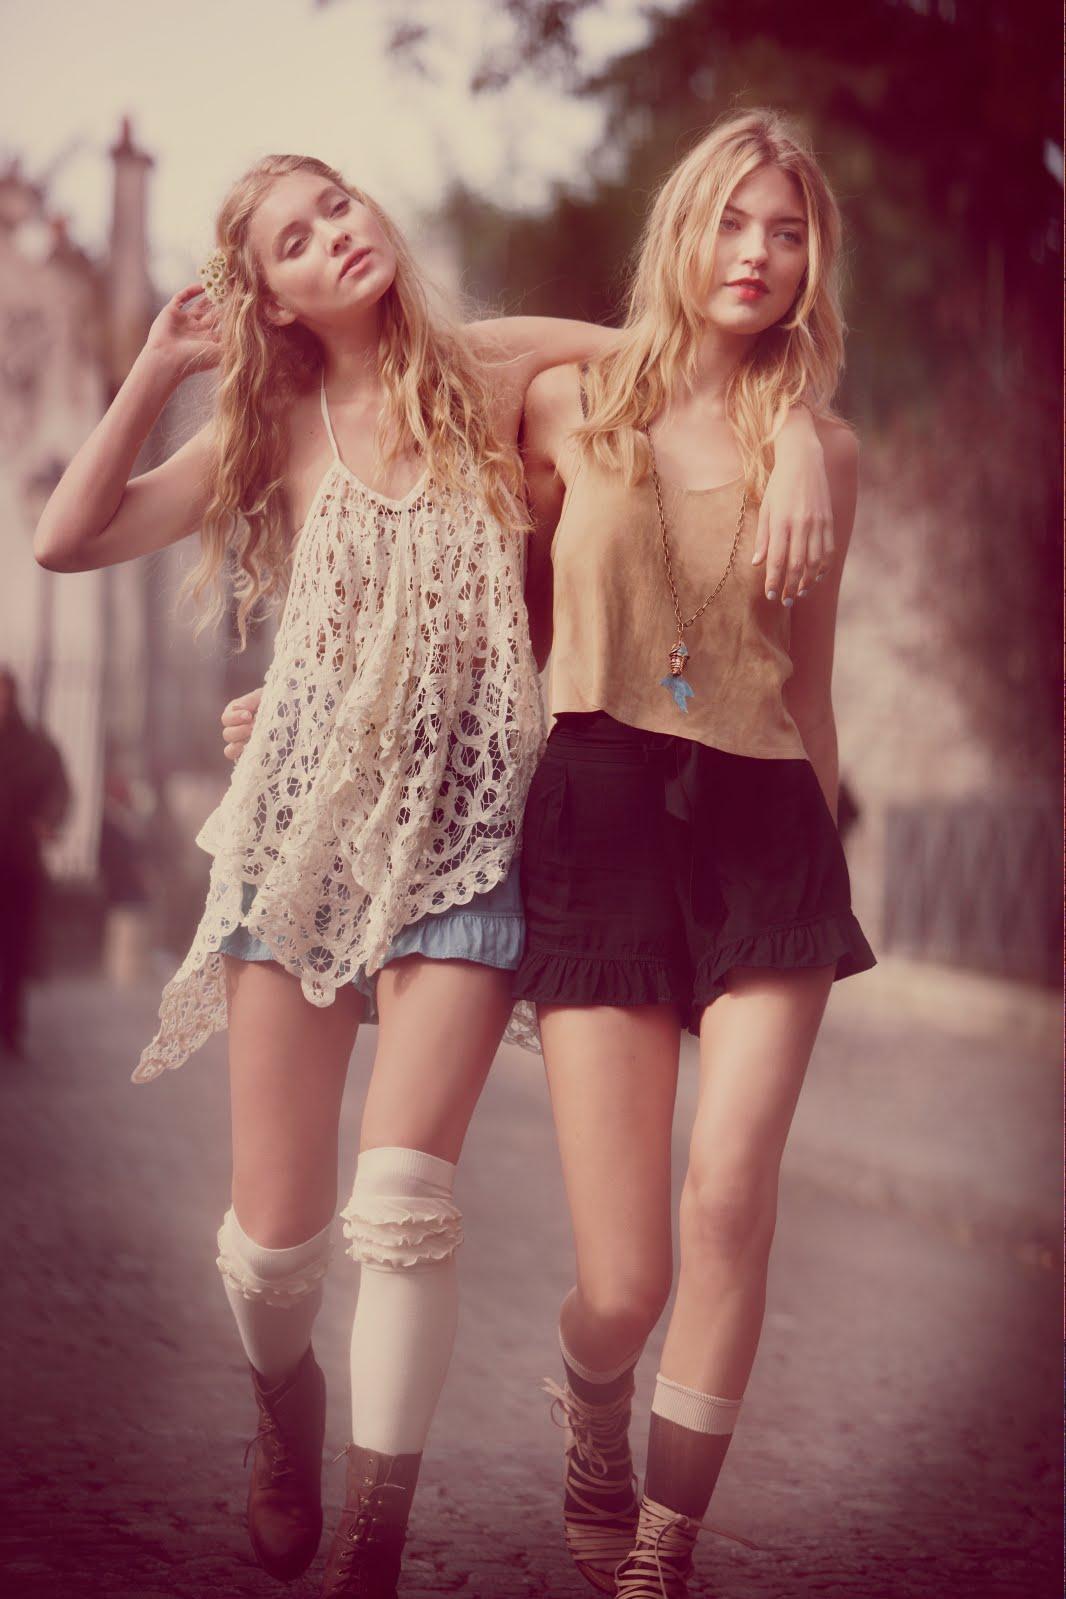 Фото двух девушек вместе 12 фотография